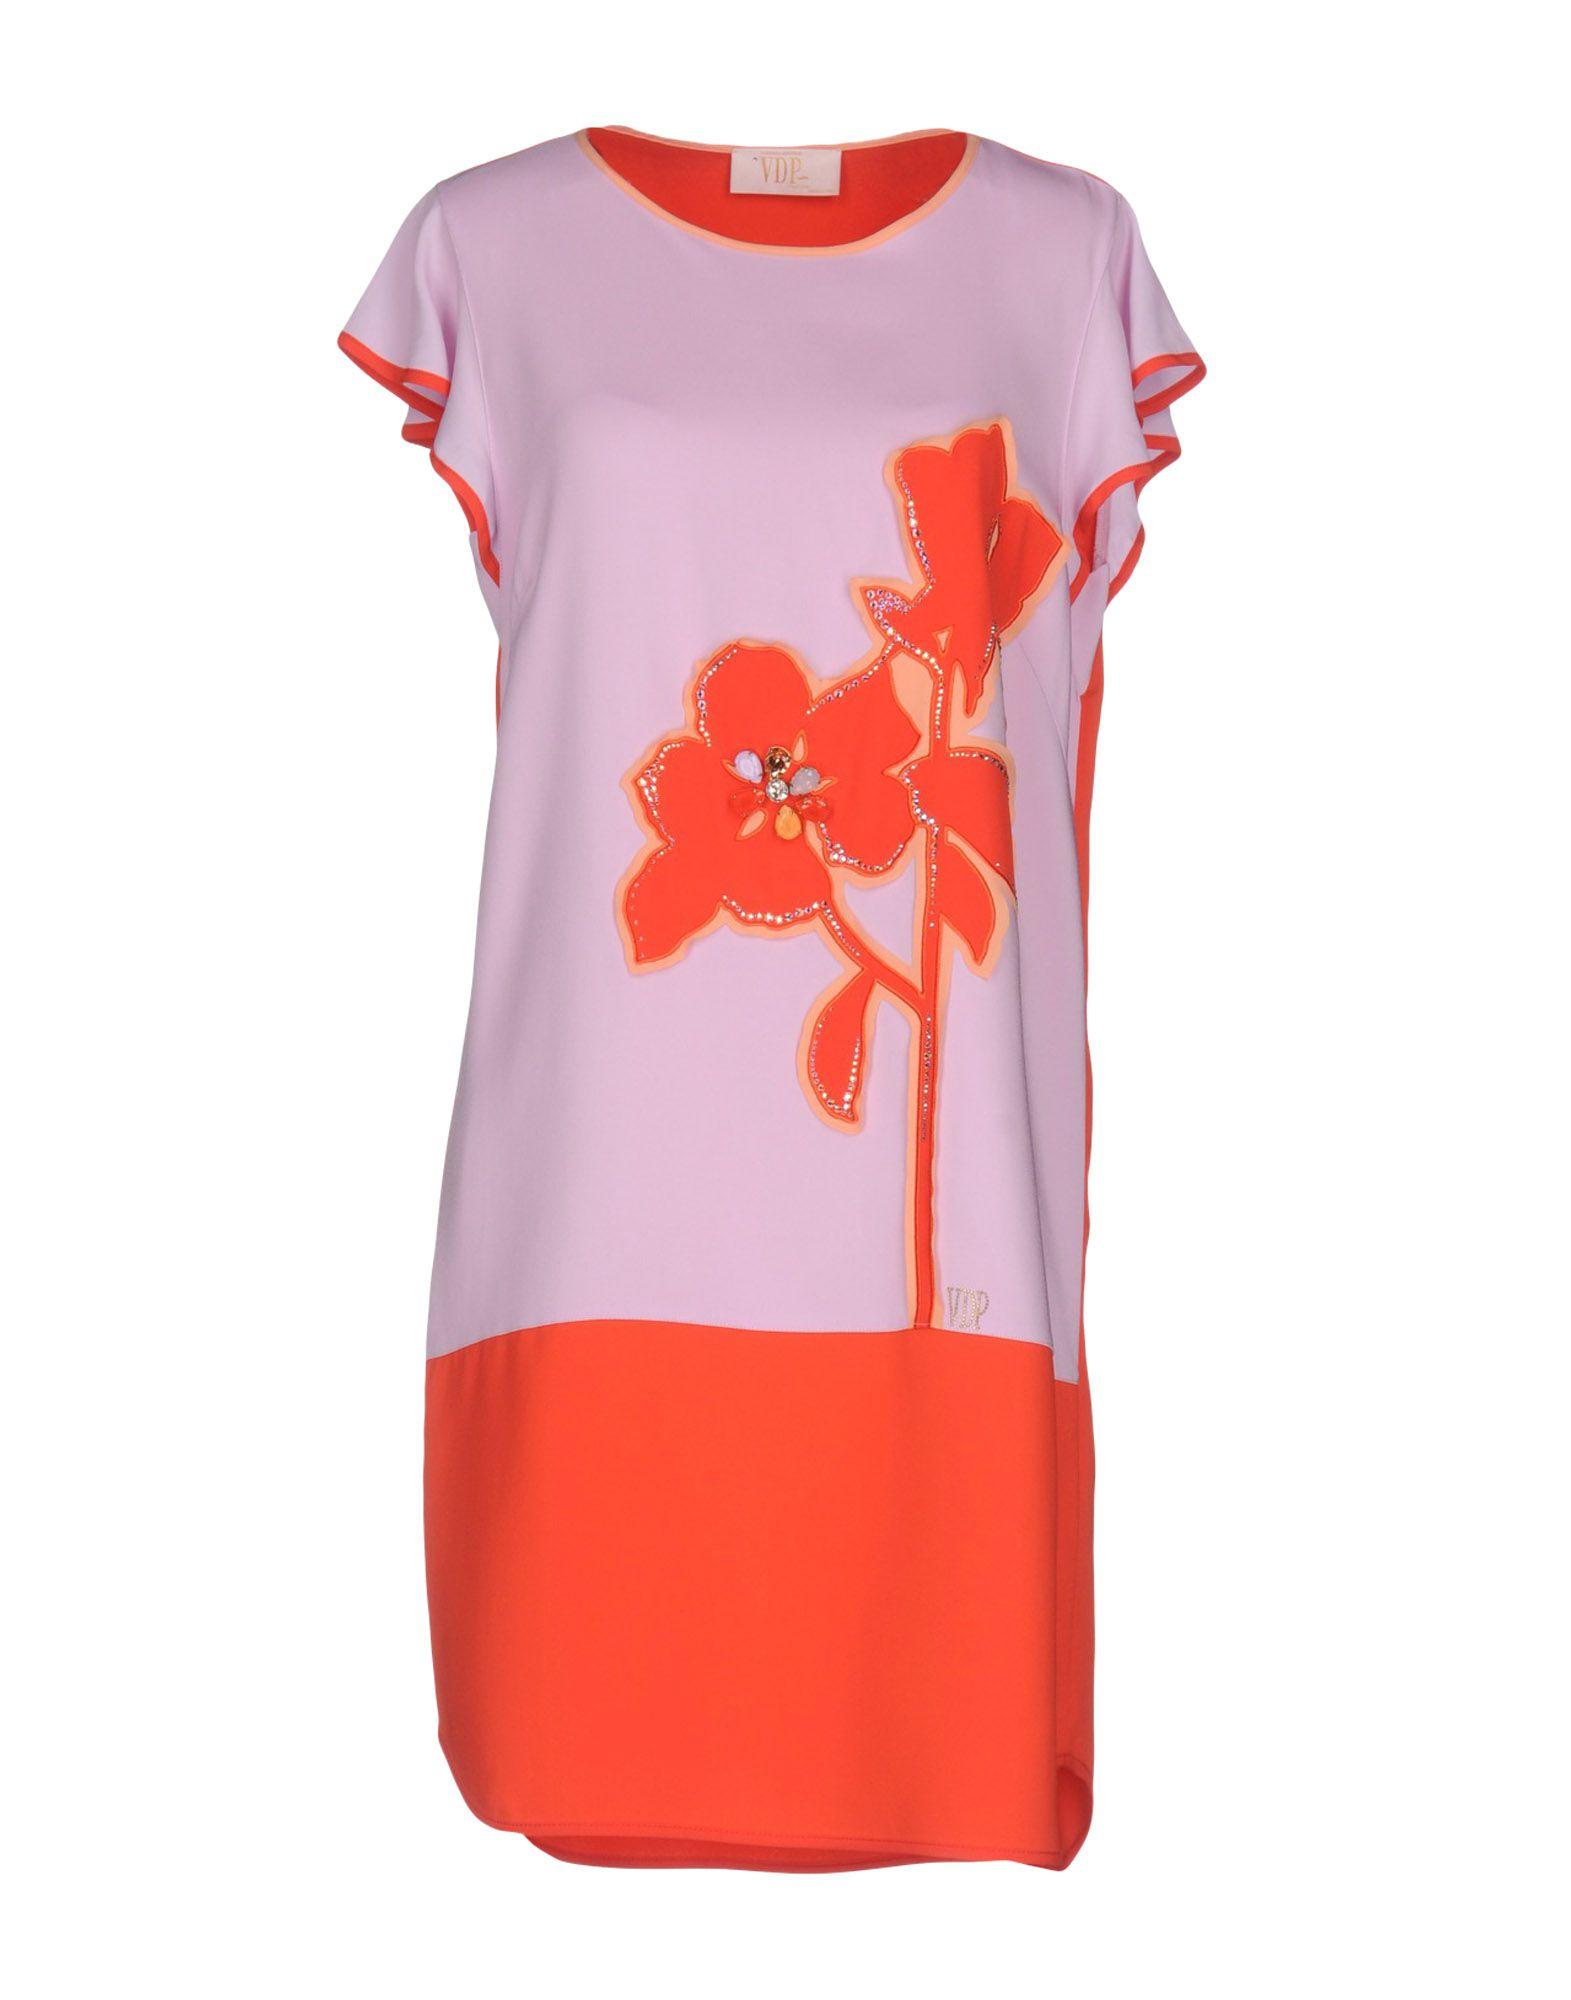 VDP COLLECTION Короткое платье платье demurya collection demurya collection mp002xw1anvz